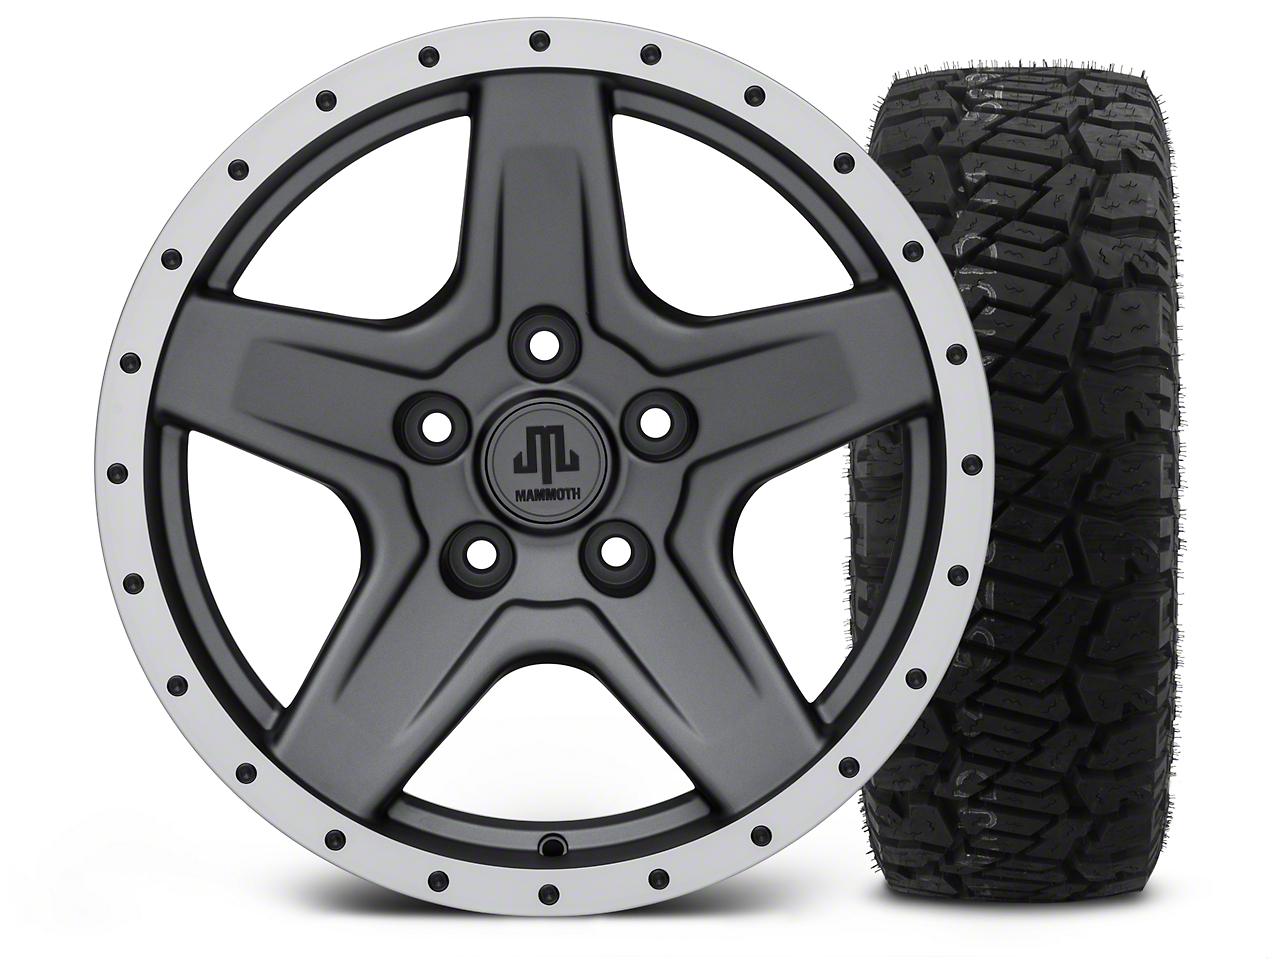 Mammoth Boulder Beadlock Style Charcoal - 17x9 Wheel - and Dick Cepek Fun Country Tire - 315/70R17 (07-18 Jeep Wrangler JK; 2018 Jeep Wrangler JL)